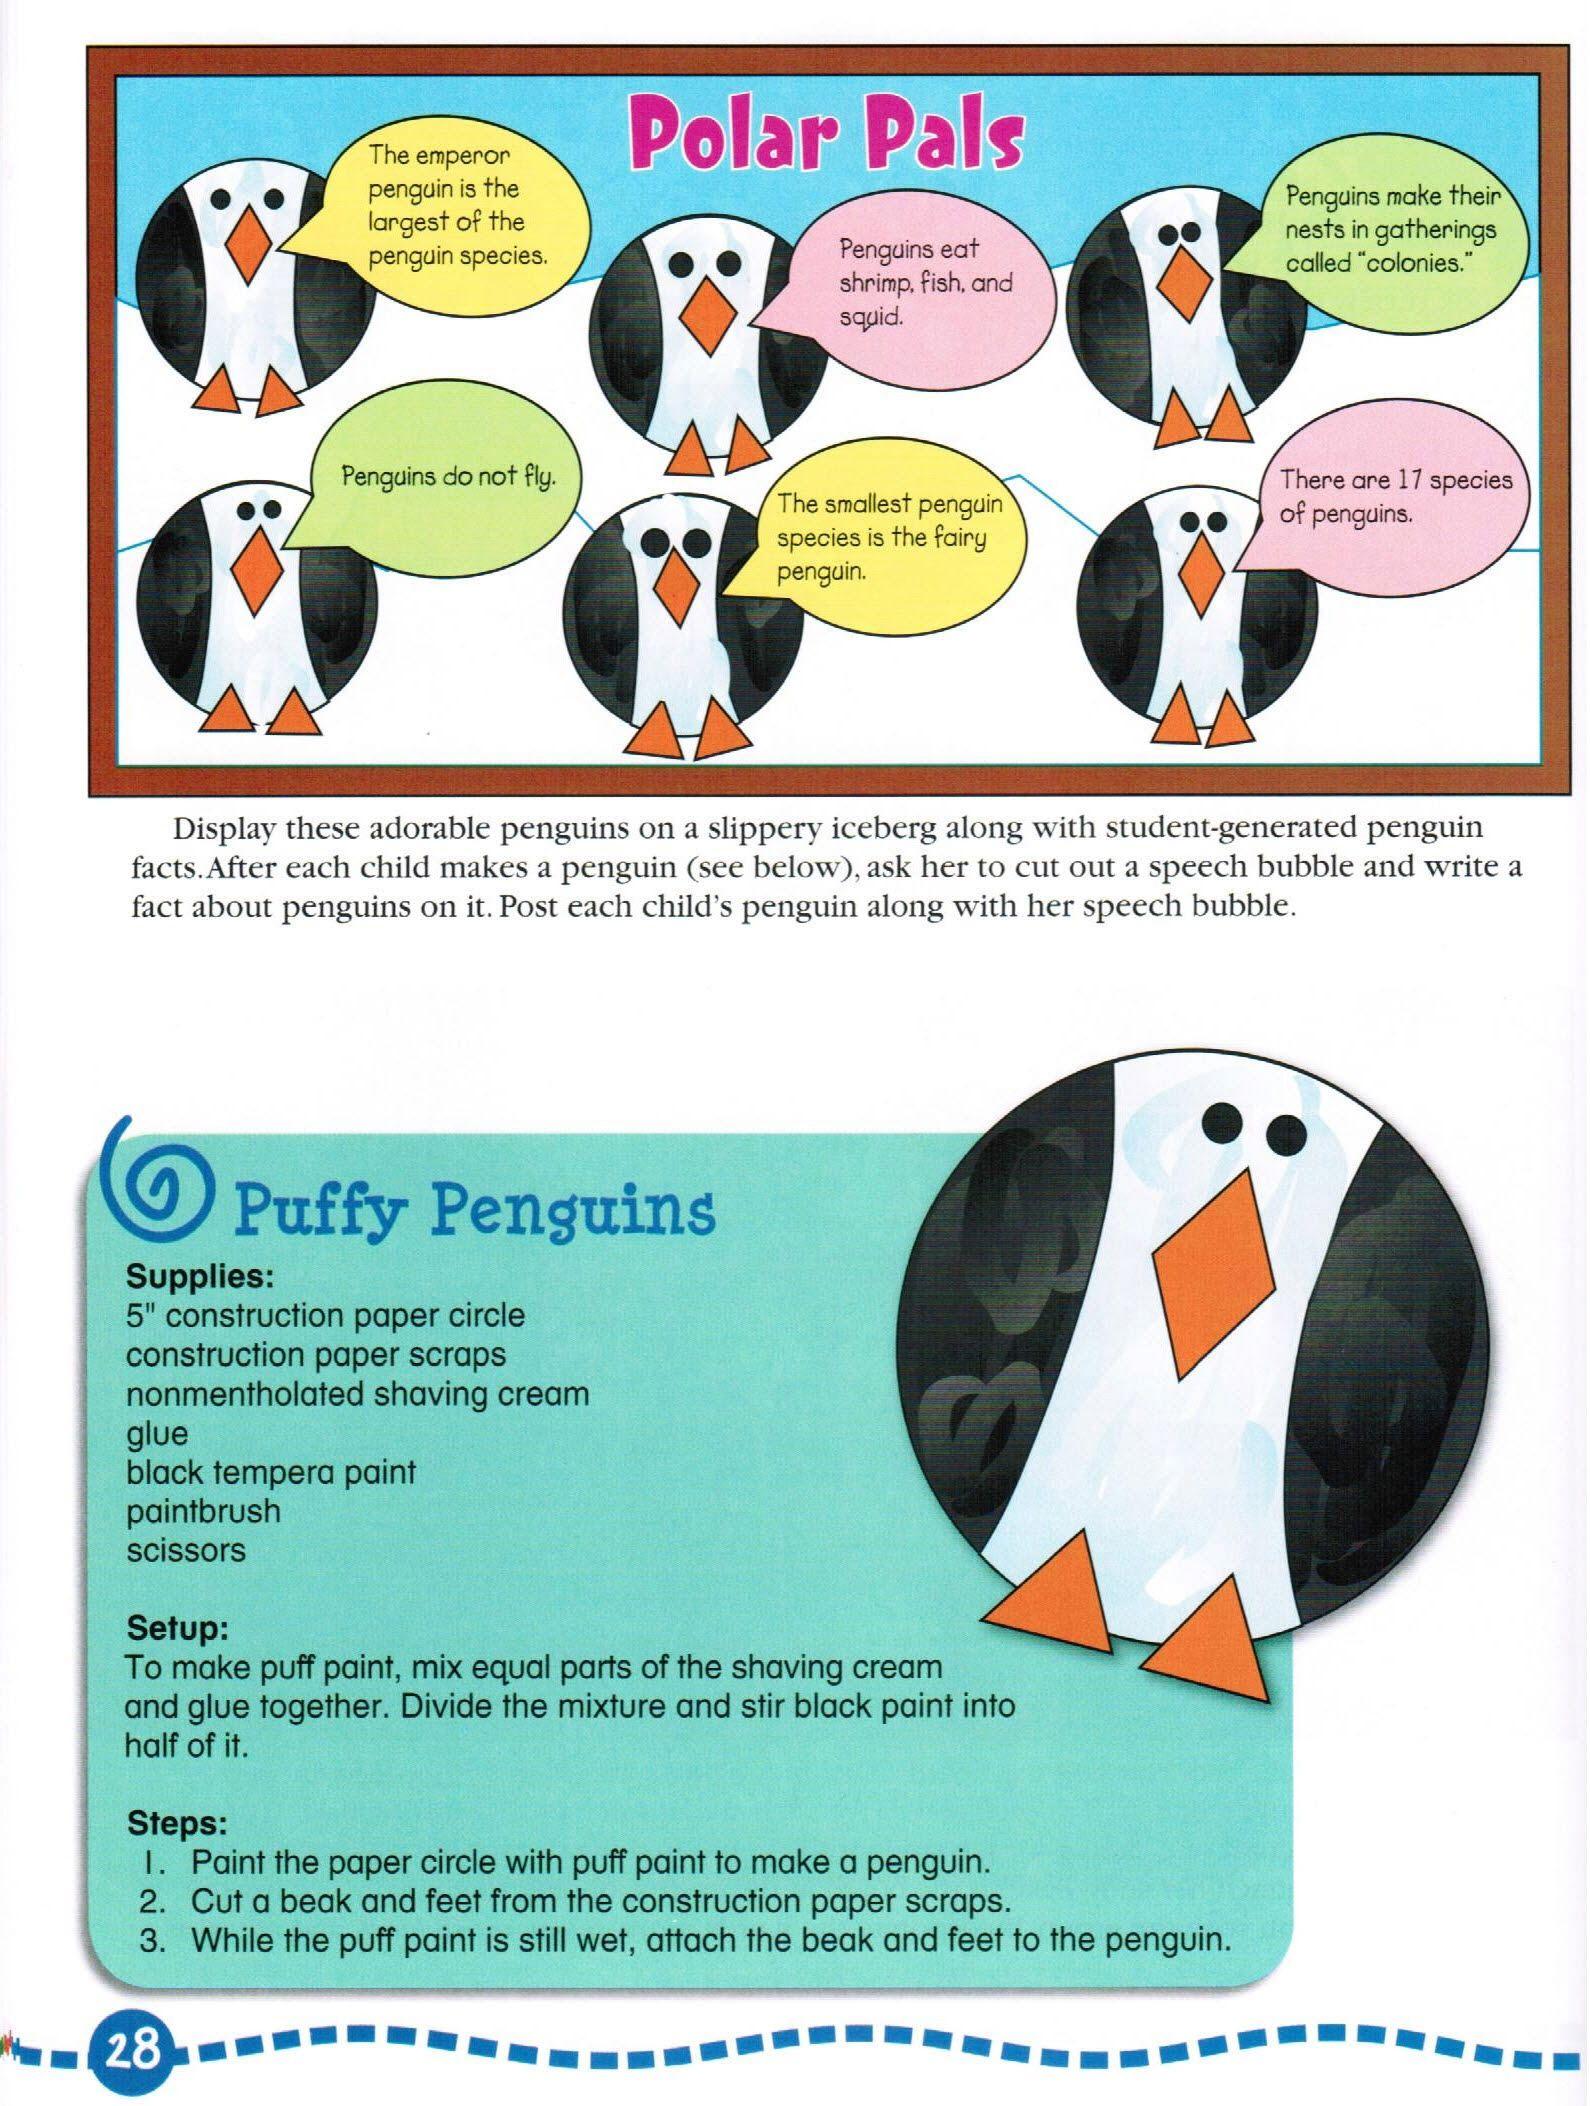 Penguins Bulletin Board and Craft | School Ideas | Preschool